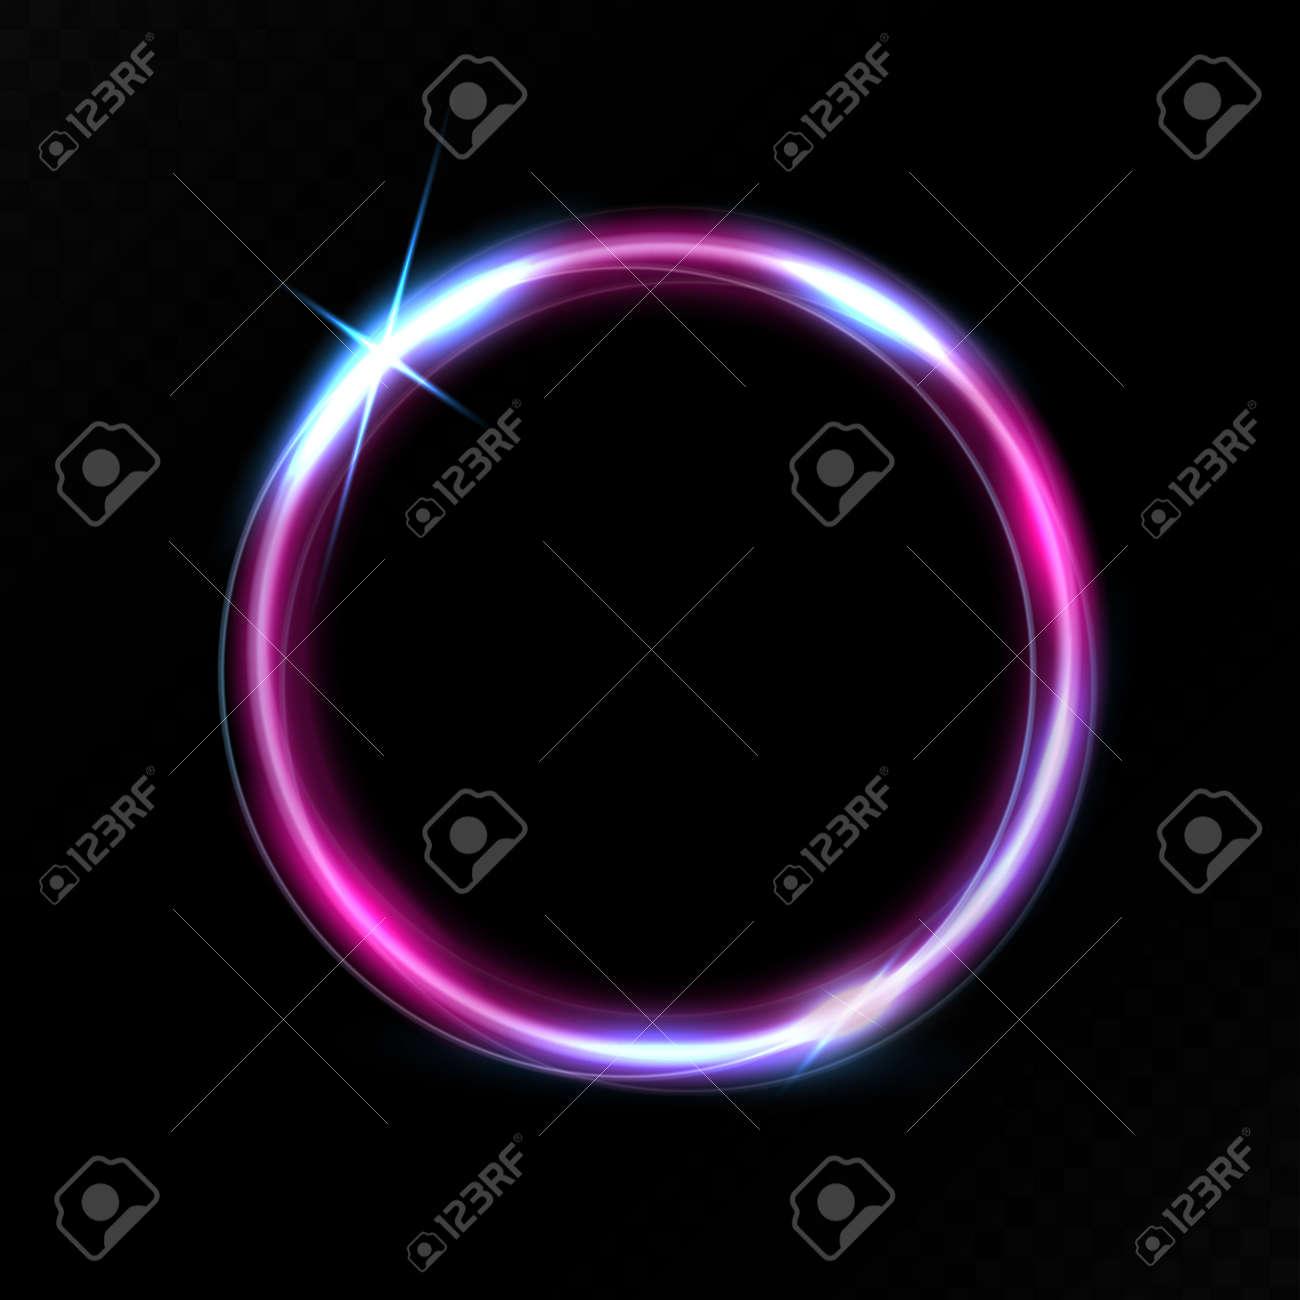 Purple circle light effect - 171398002